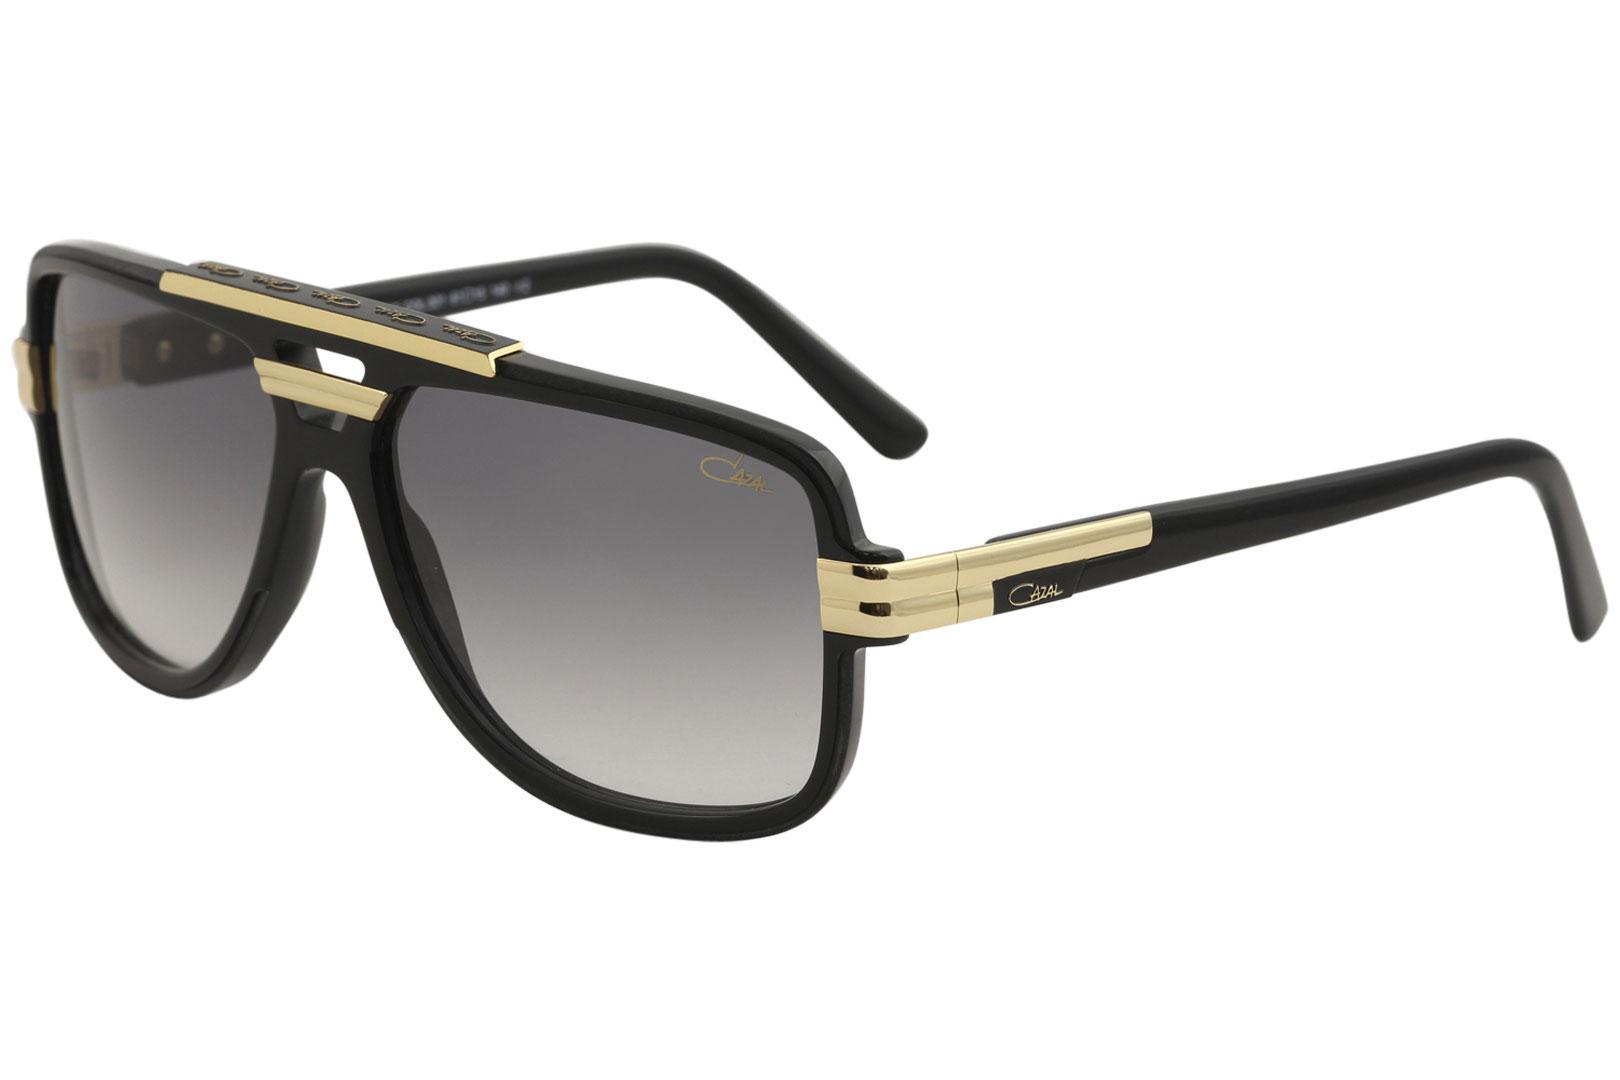 68da974accc Cazal Legends Men s 8037 Retro Pilot Sunglasses